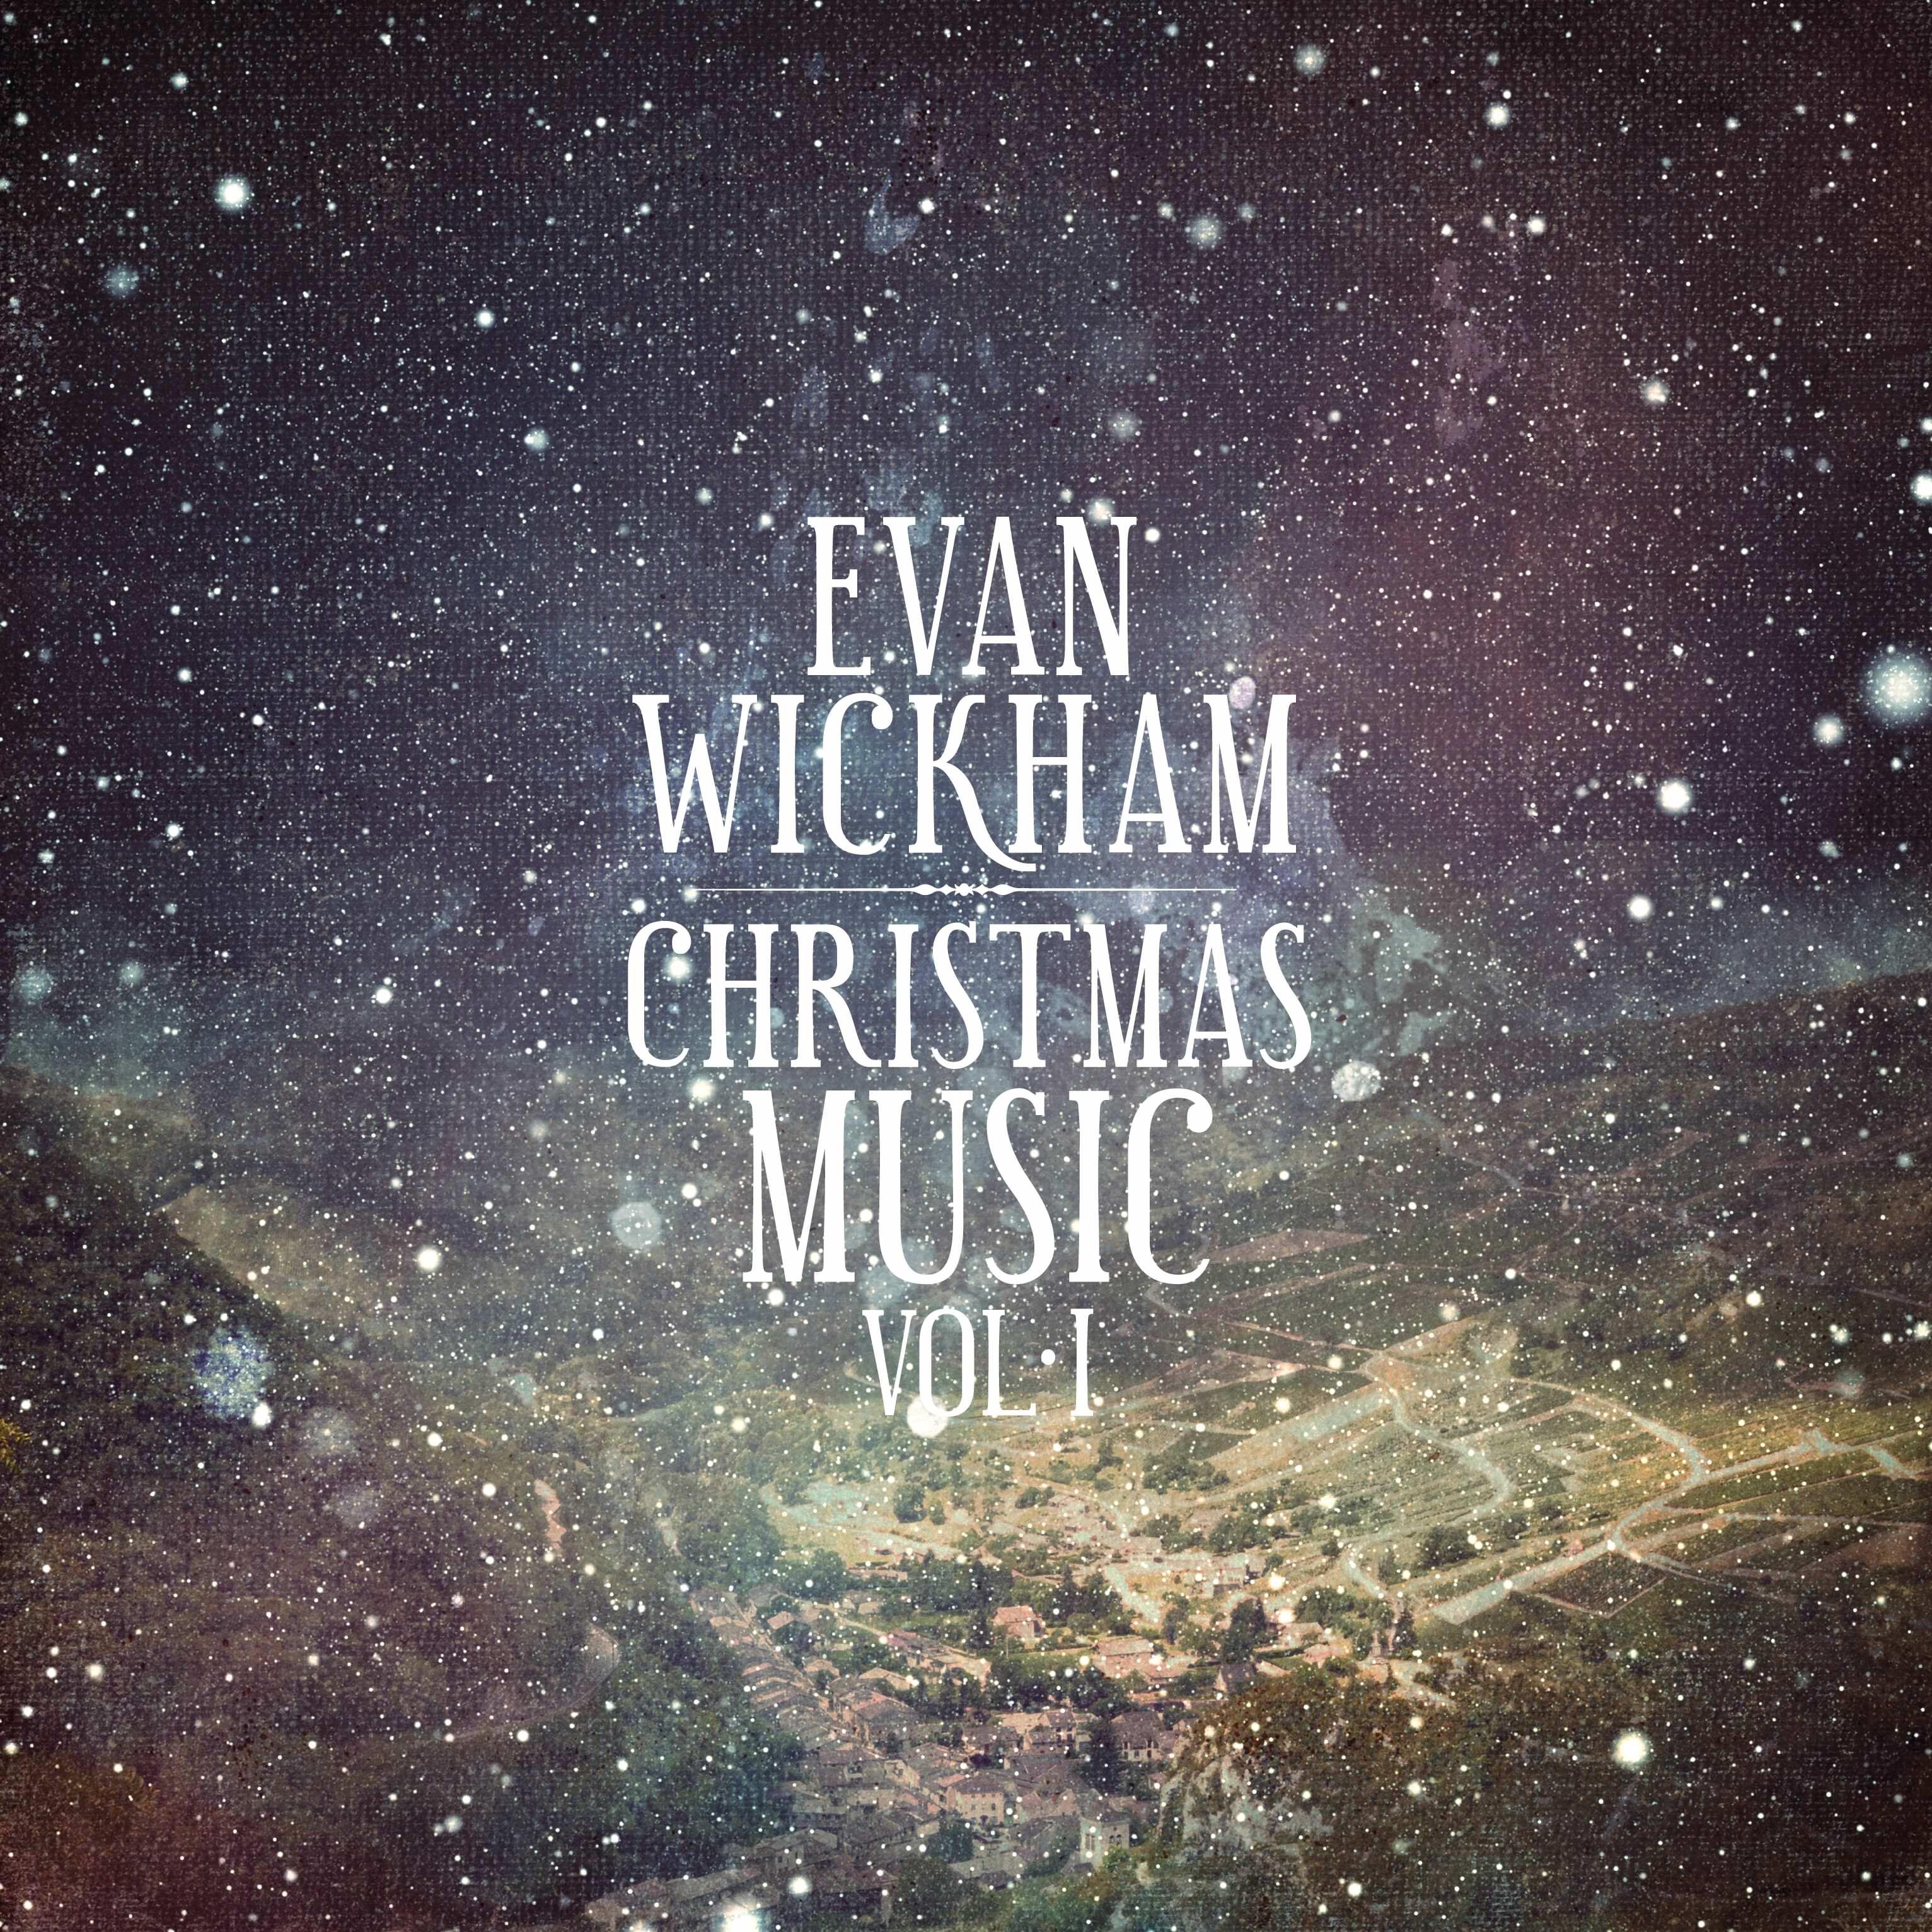 Christmas Music Vol. 1